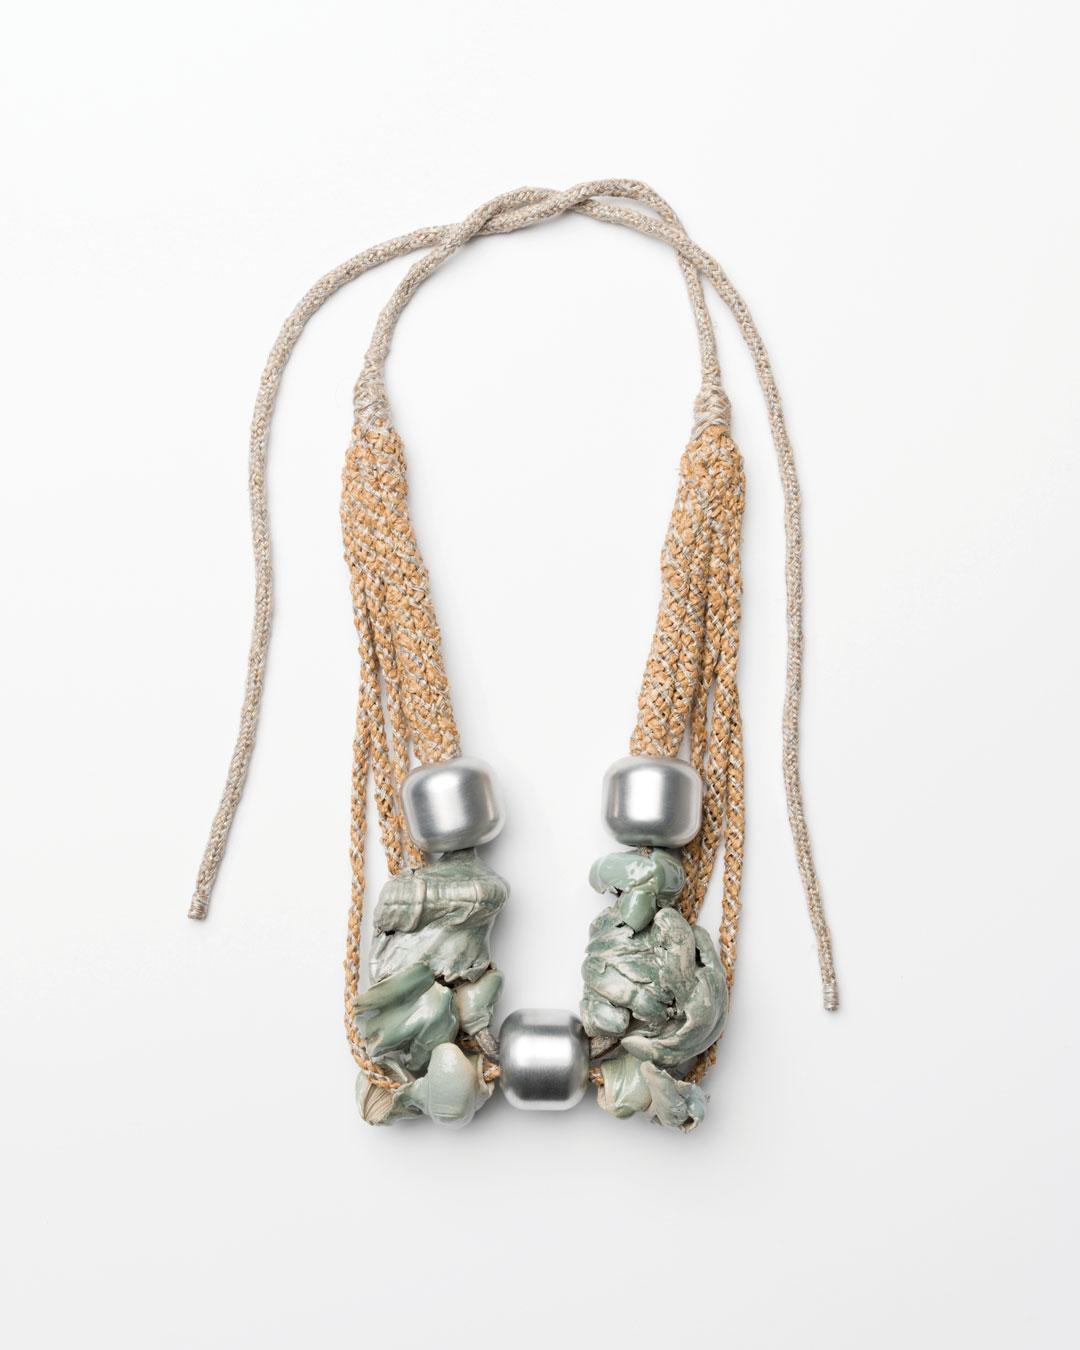 Ineke Heerkens, Everybody Go Up, 2017, necklace; linen, synthetic silk, raffia, banana leaf, aluminium, ceramic, glaze, lustre, 340 x 160 x 60 mm, €2500